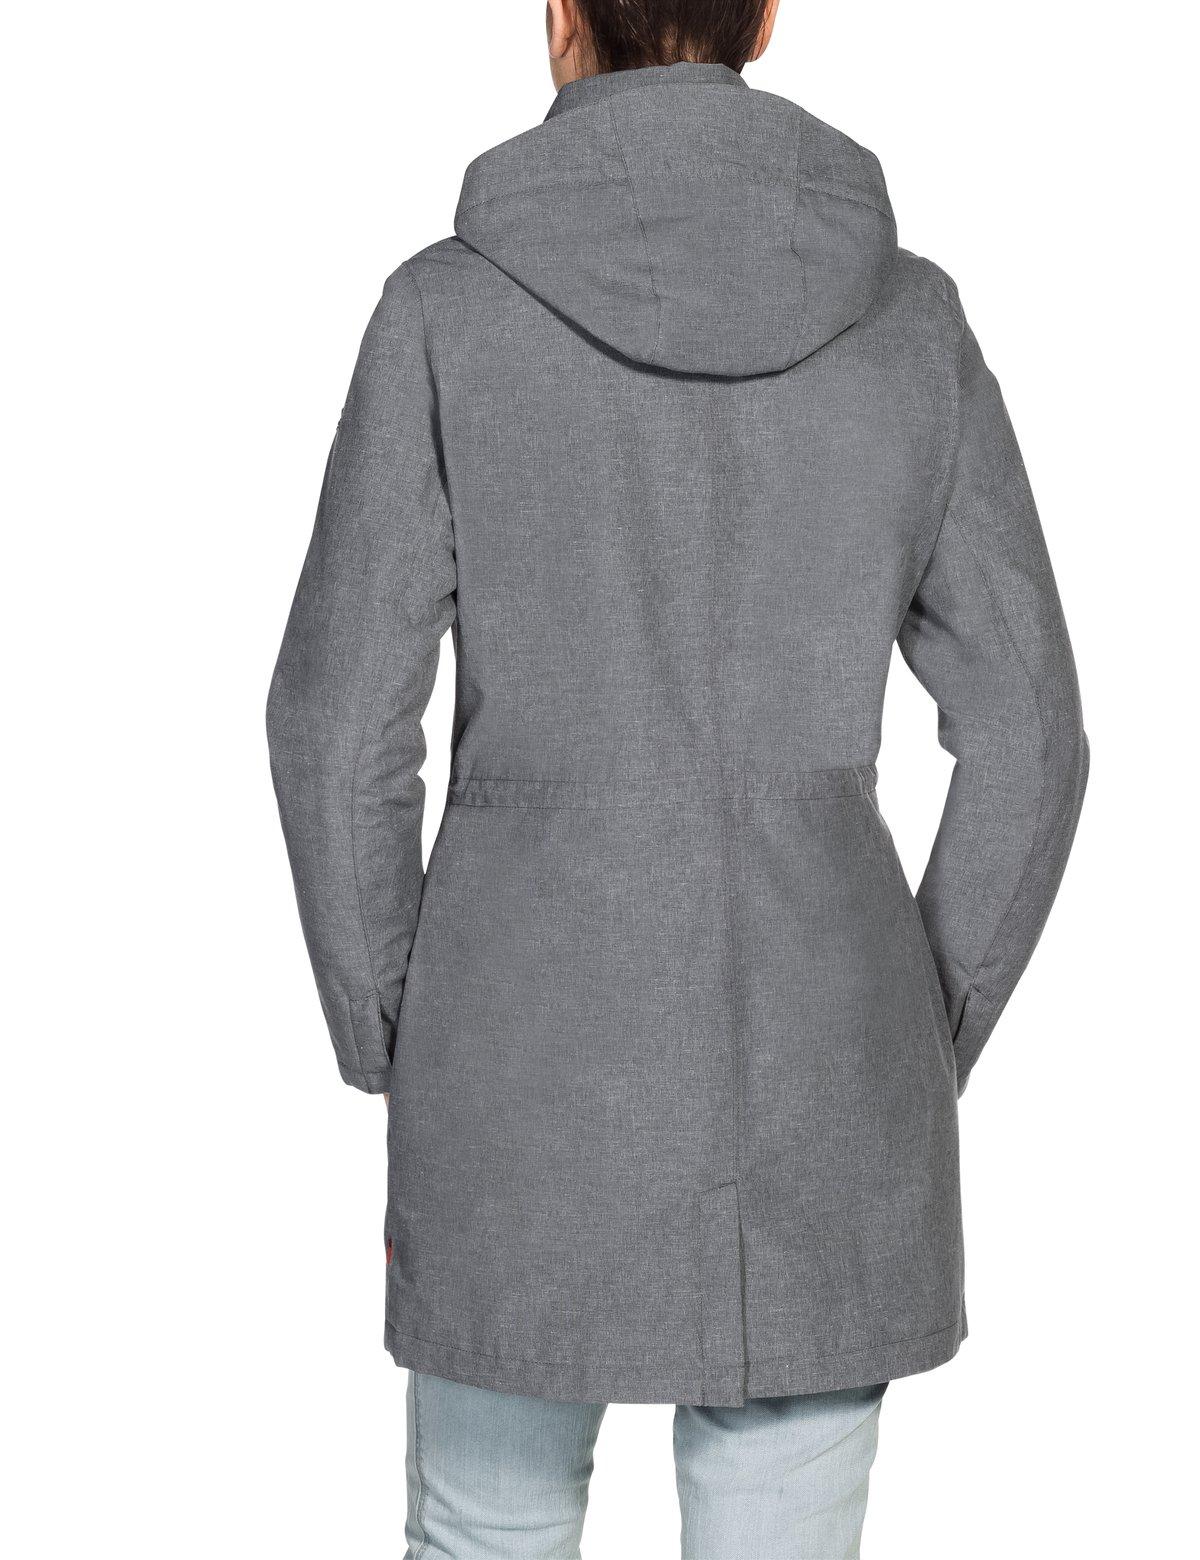 71Vn9KL8EiL - VAUDE Women's Ceduna Coat Jacket